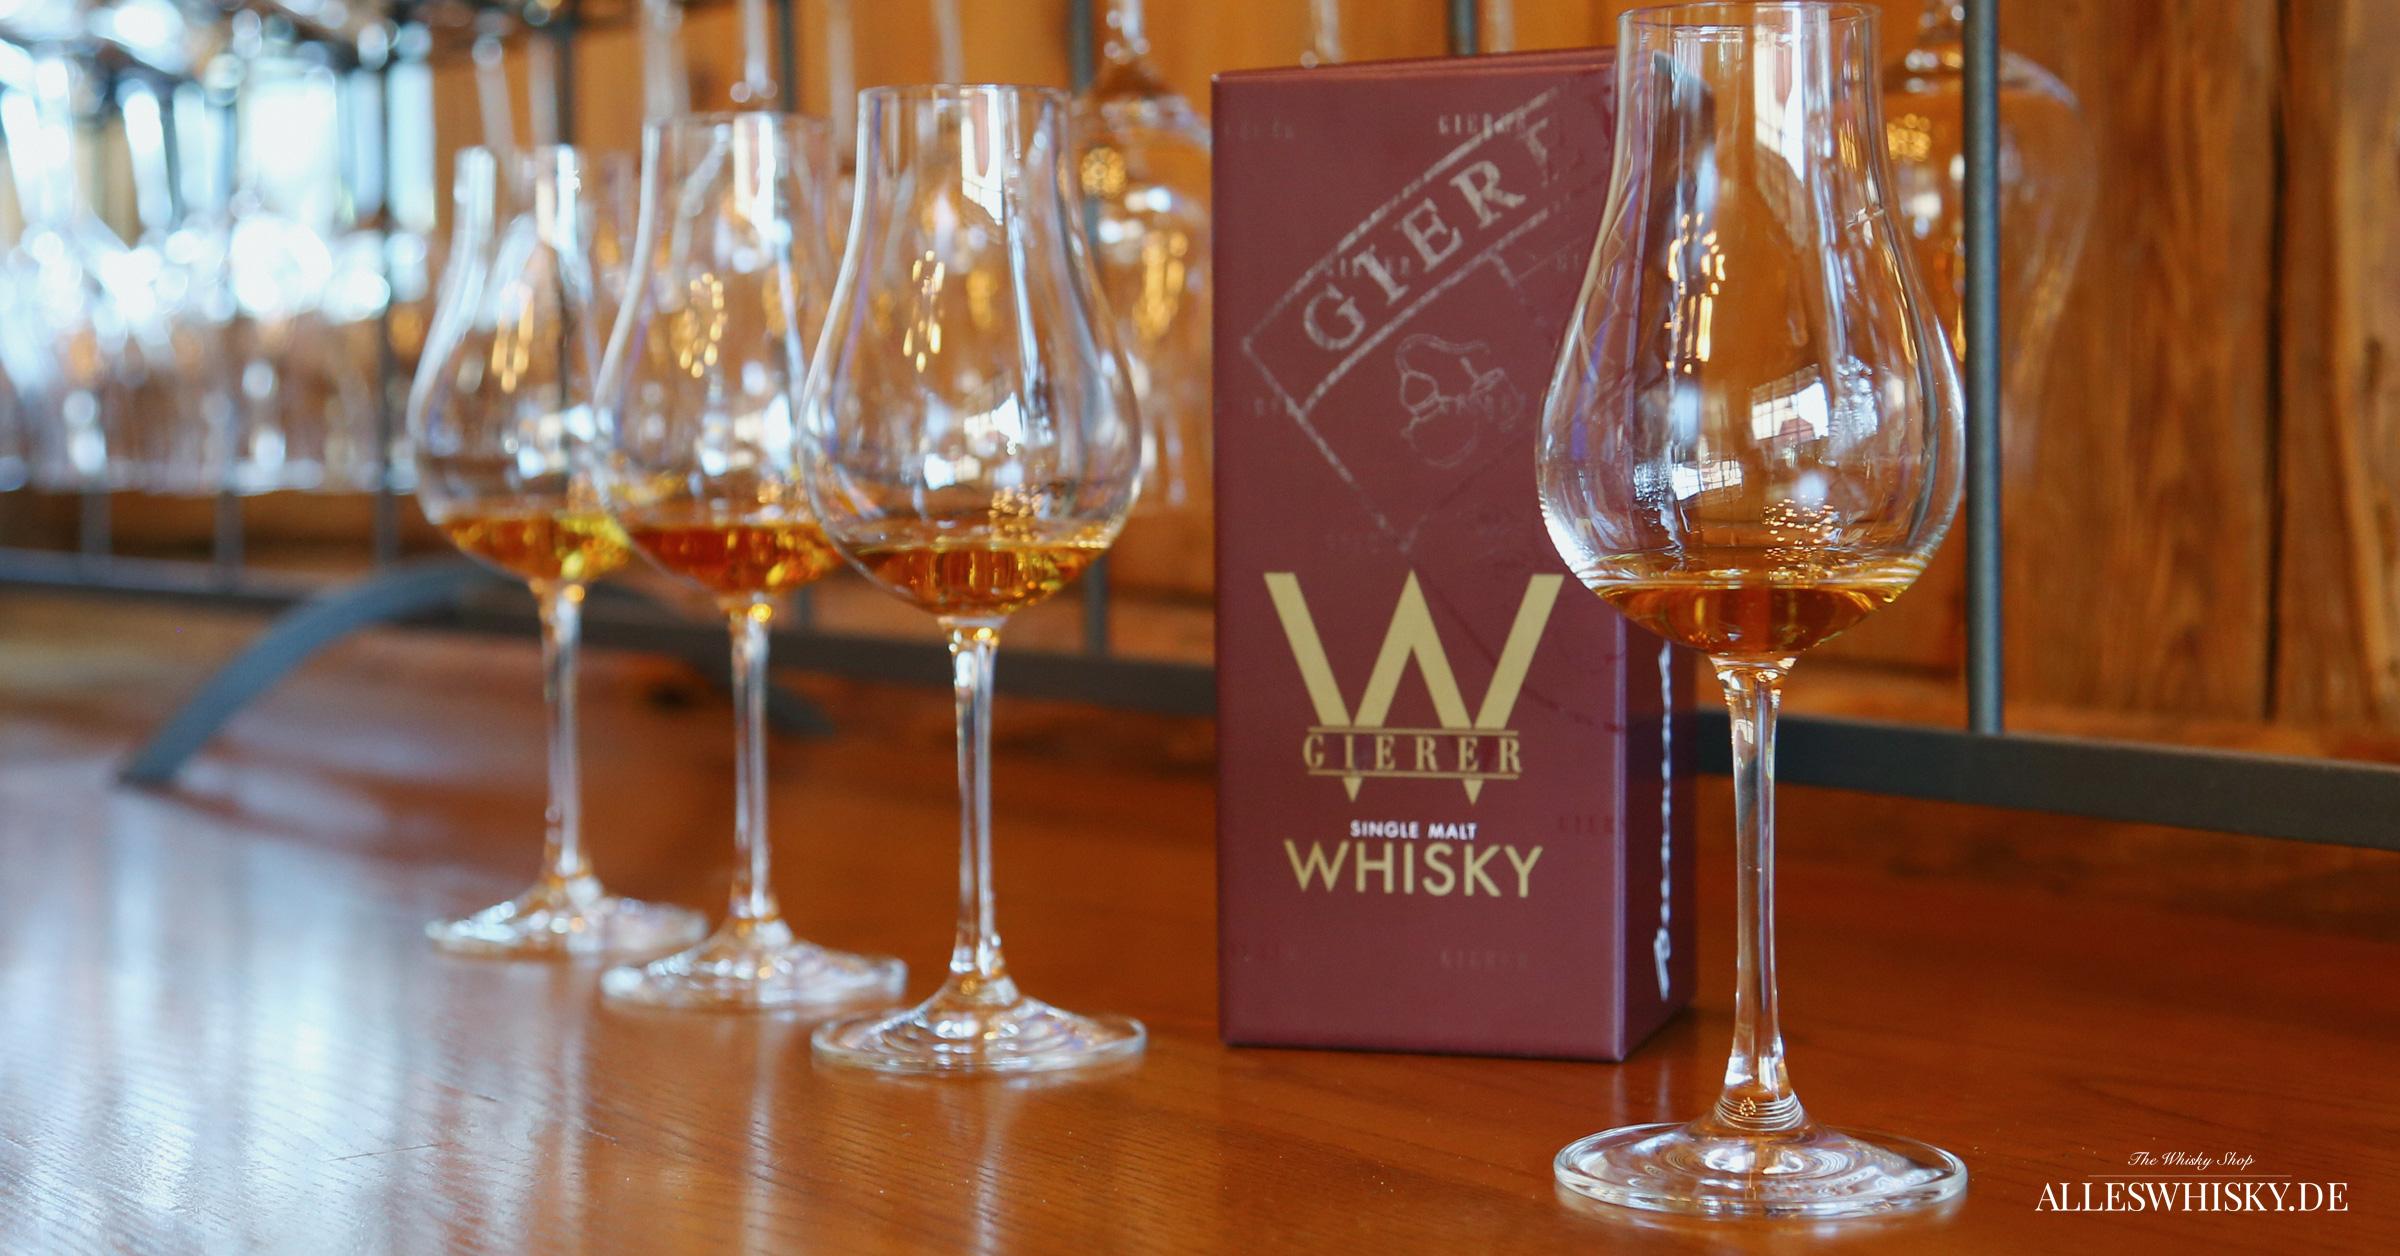 Gierer Whisky Präsentation mit Nosing Gläsern